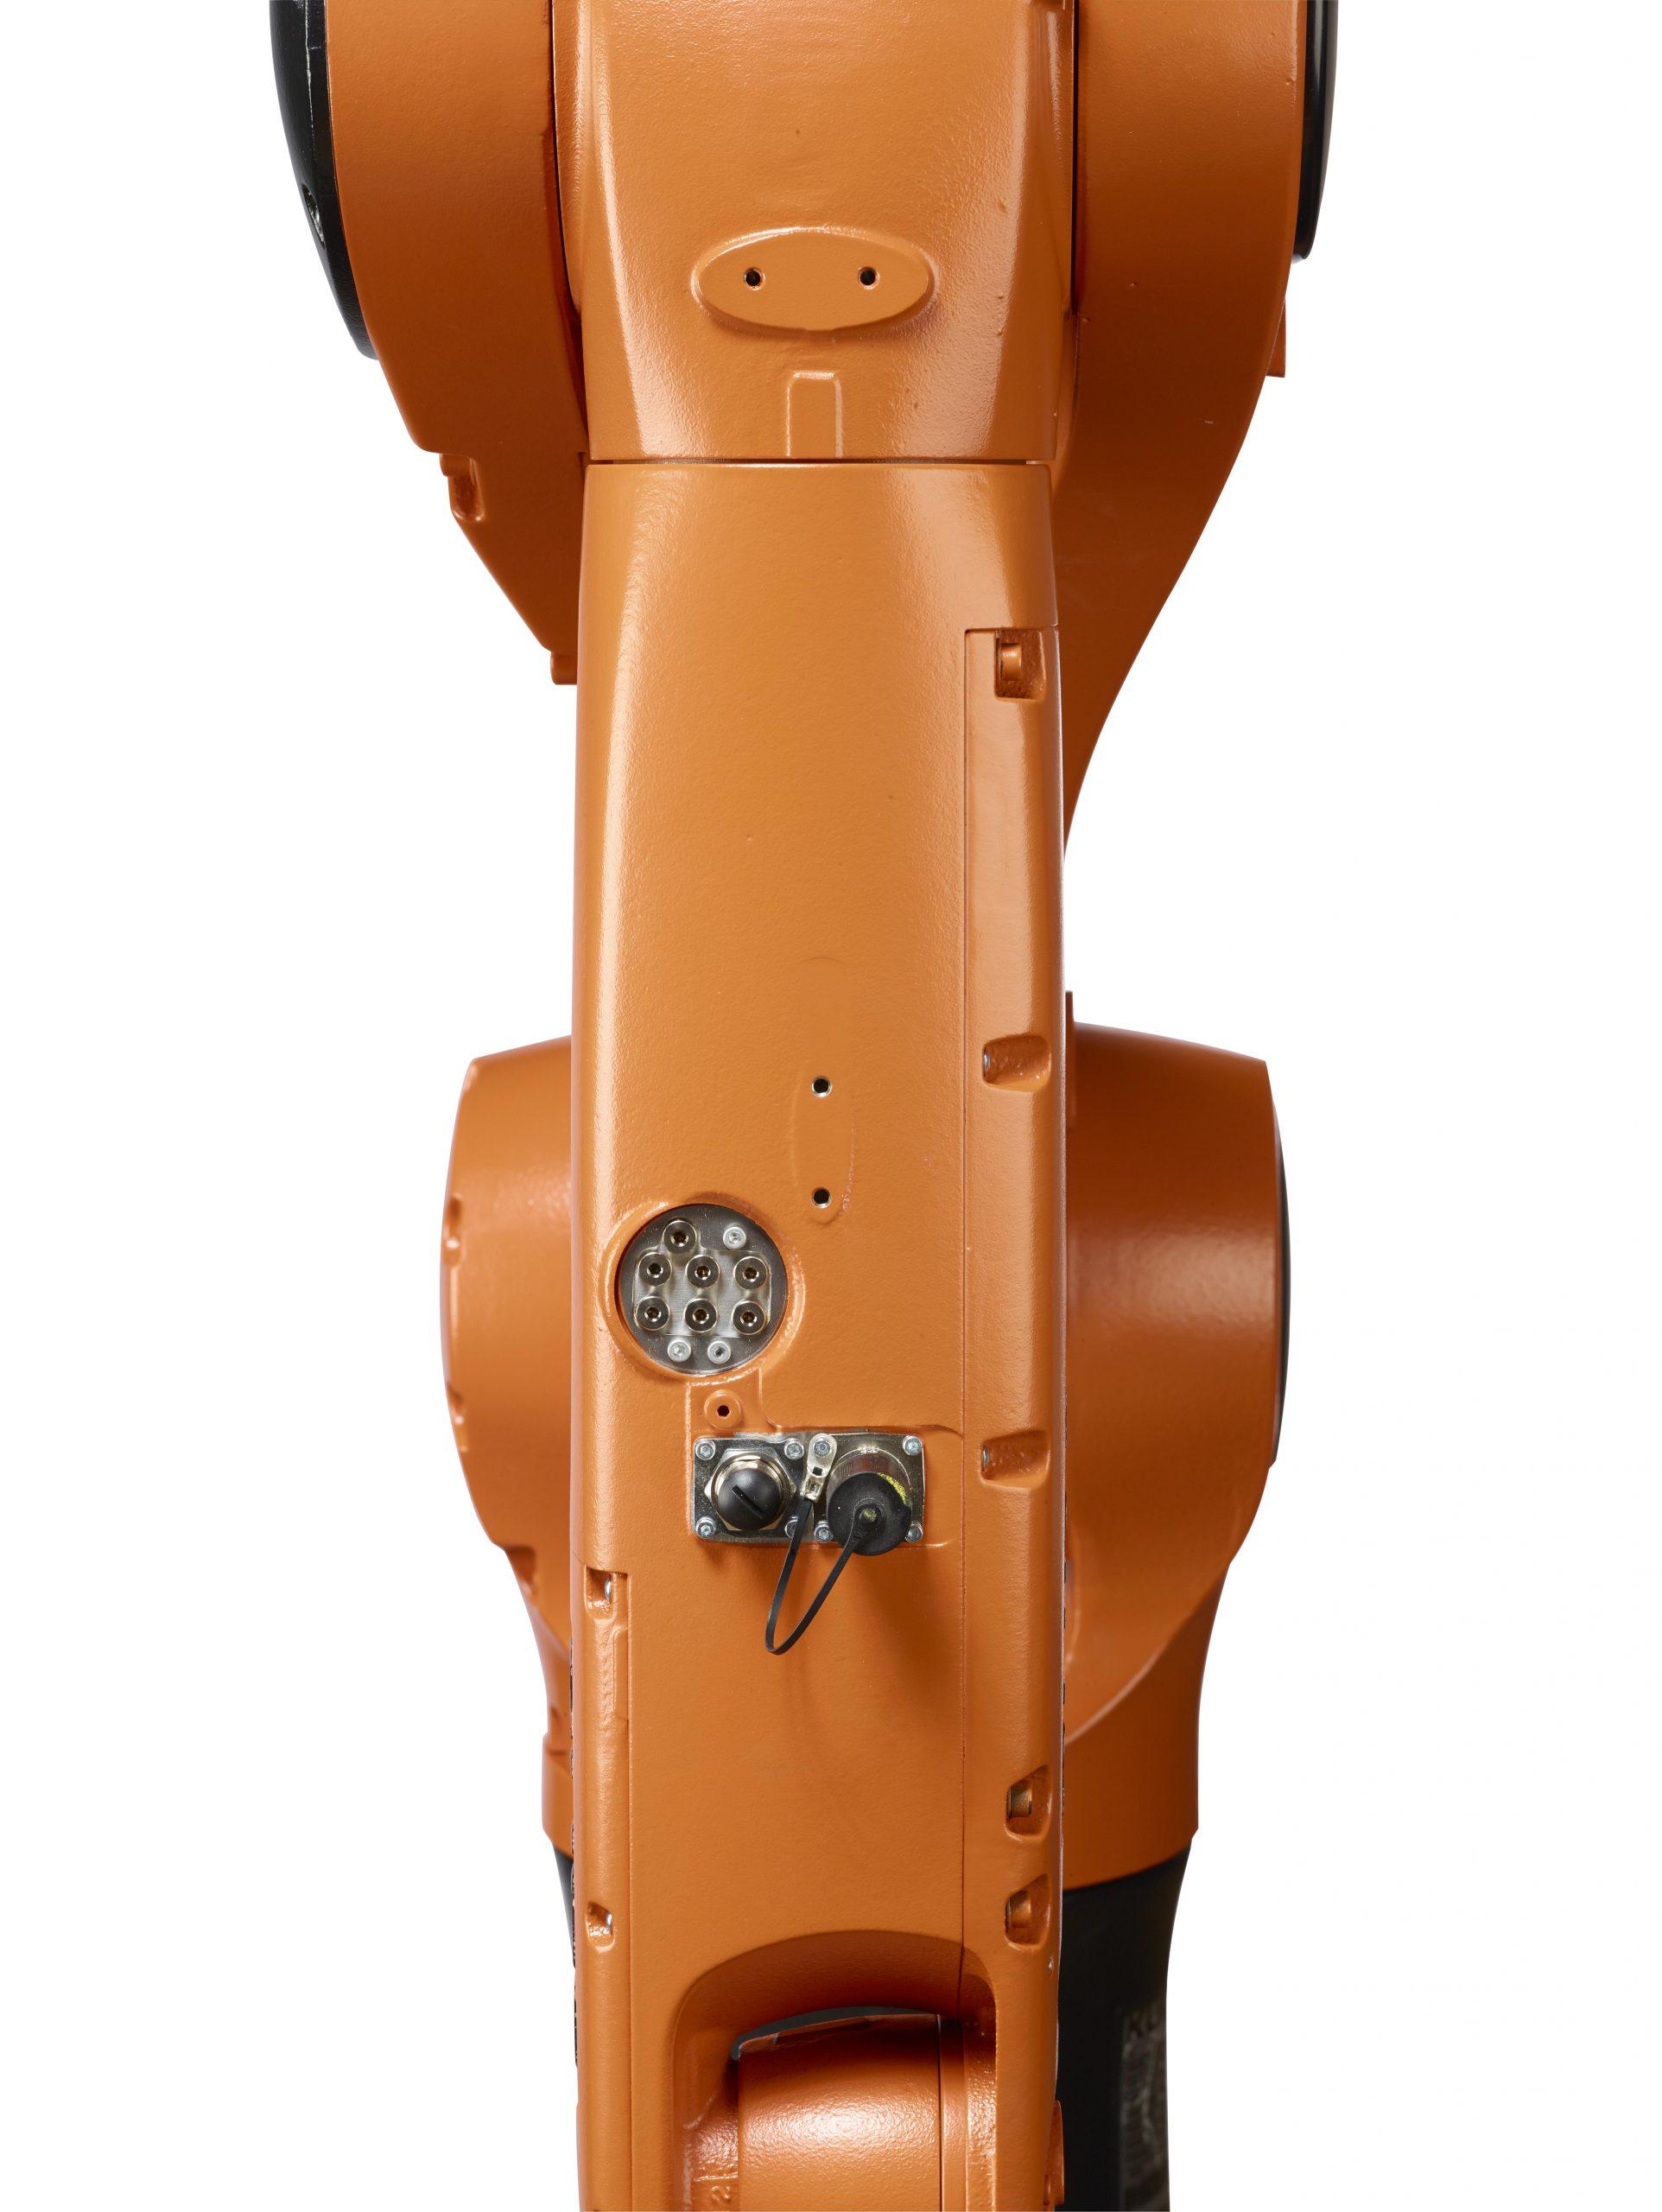 KUKA KR 6 R700 sixx (KR AGILUS)-8